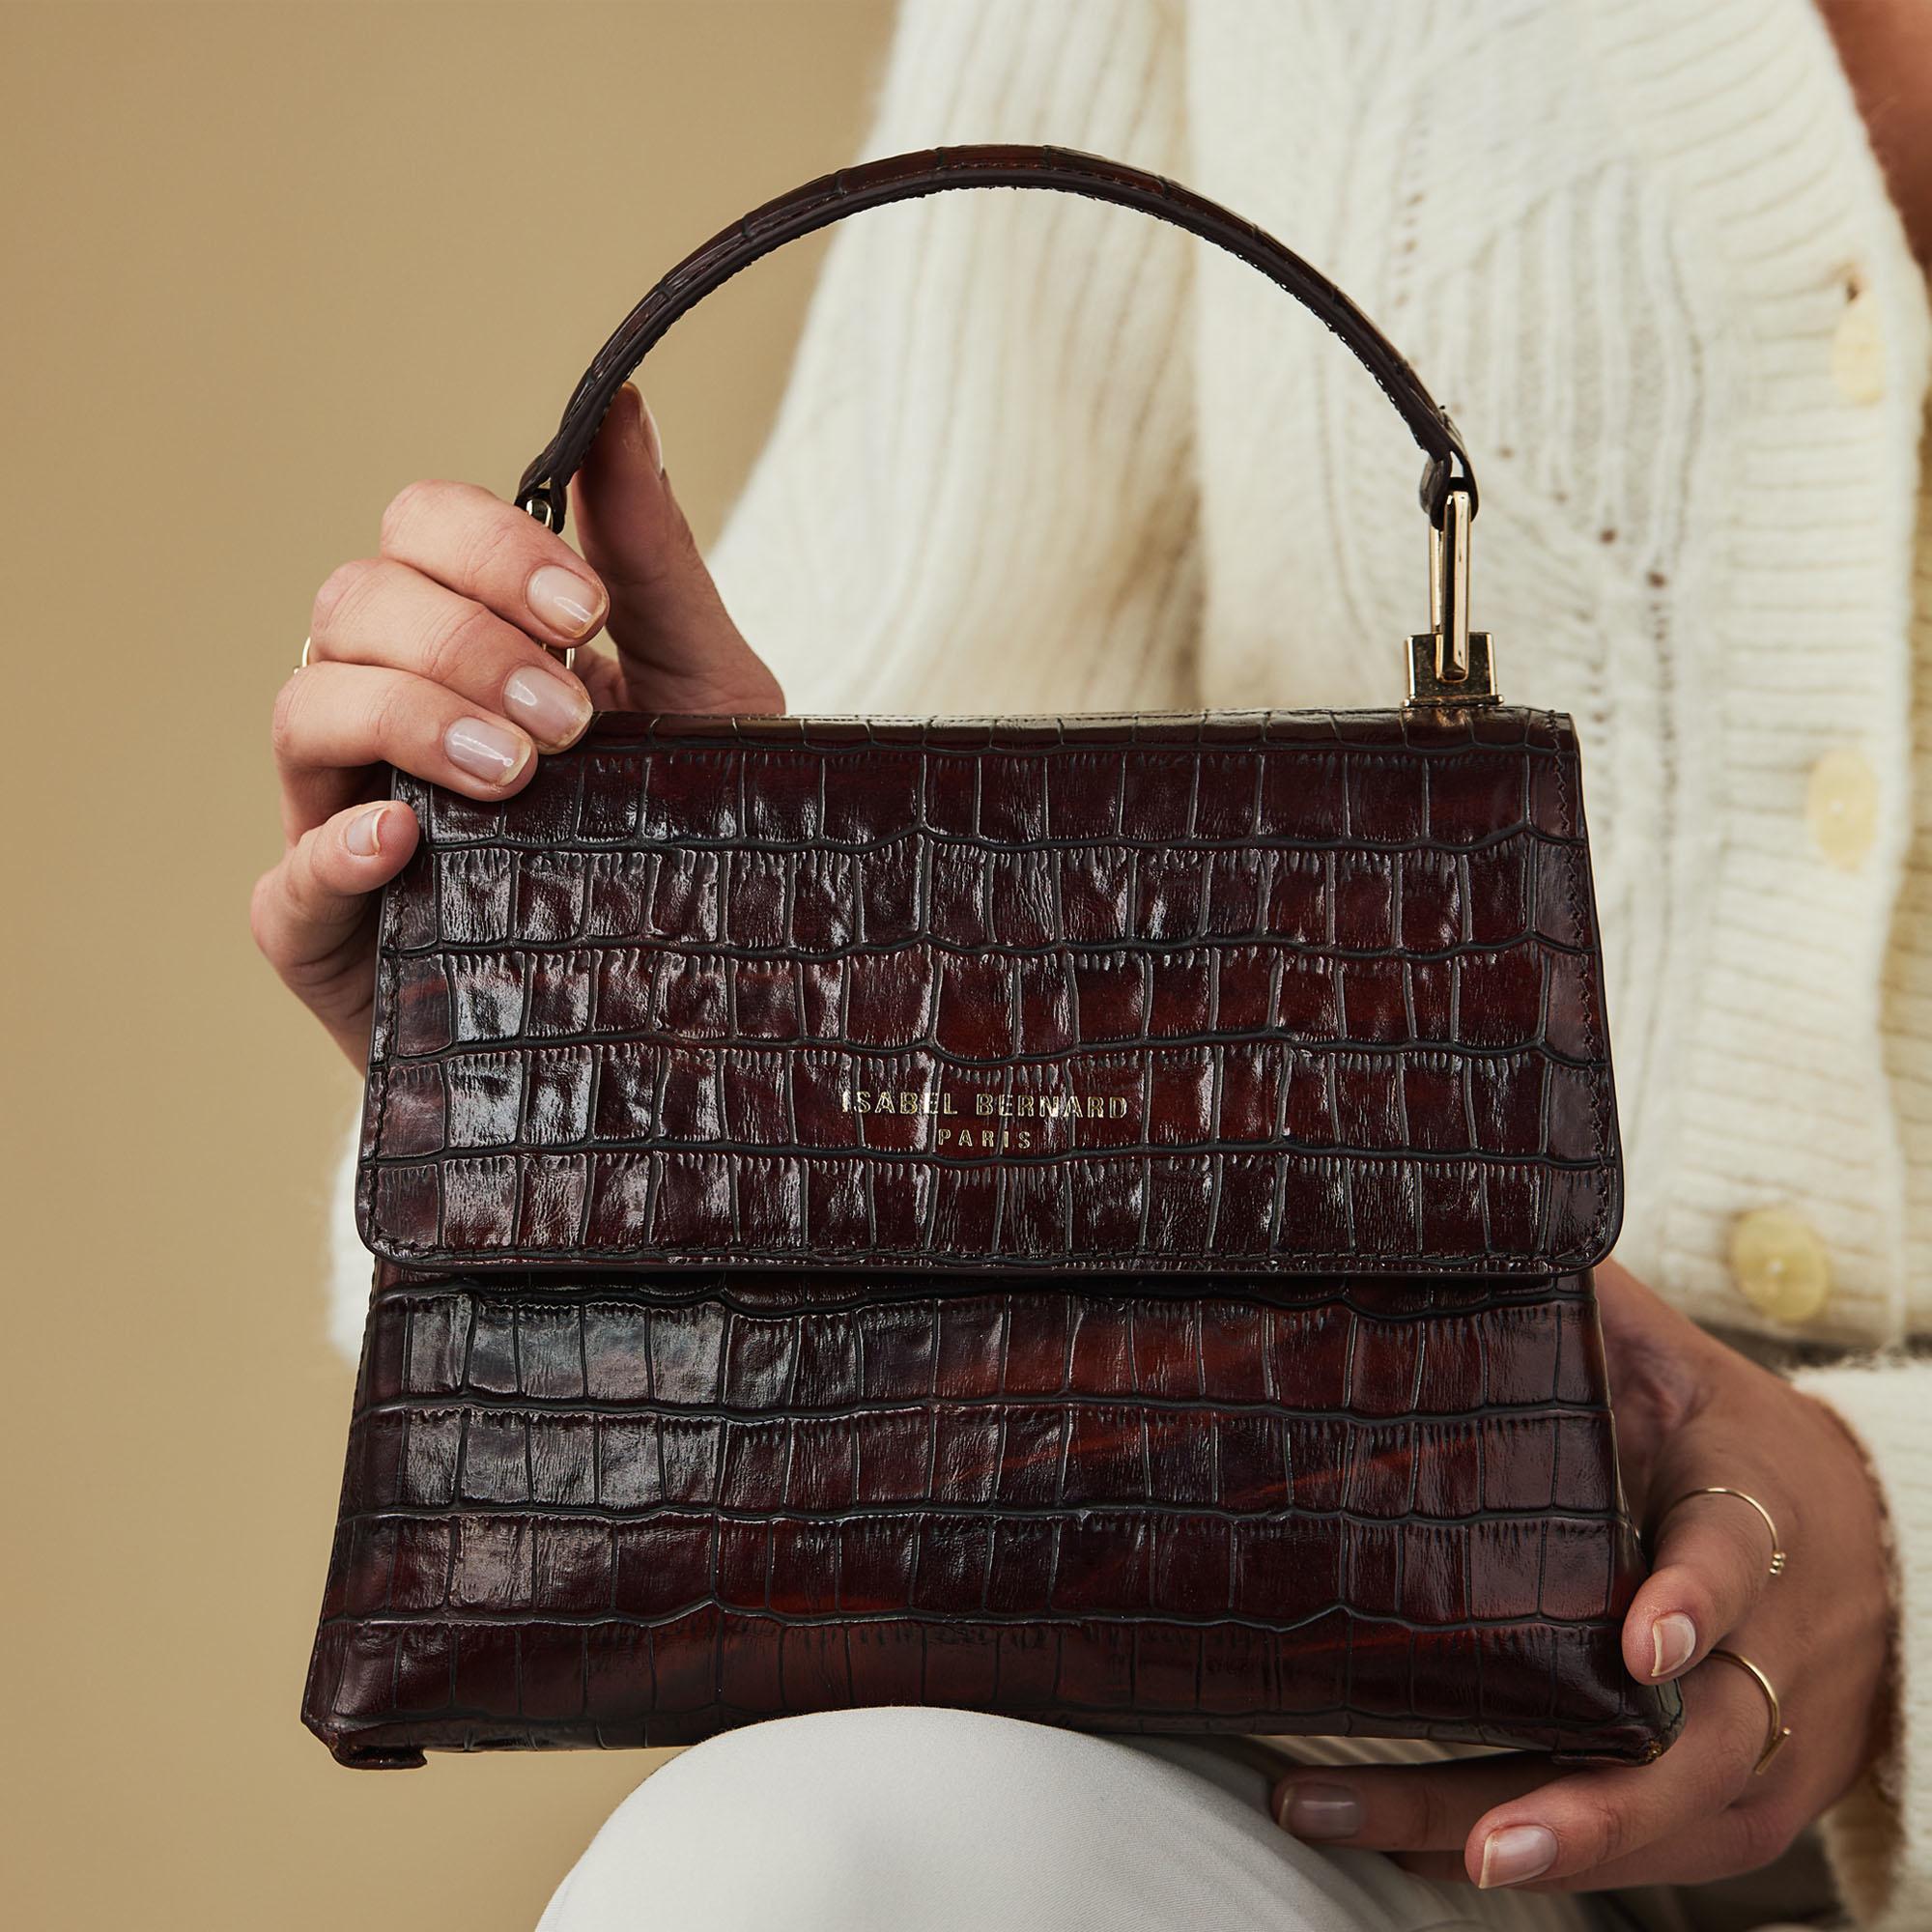 Isabel Bernard Femme Forte Heline sac à main en cuir de veau marron croco